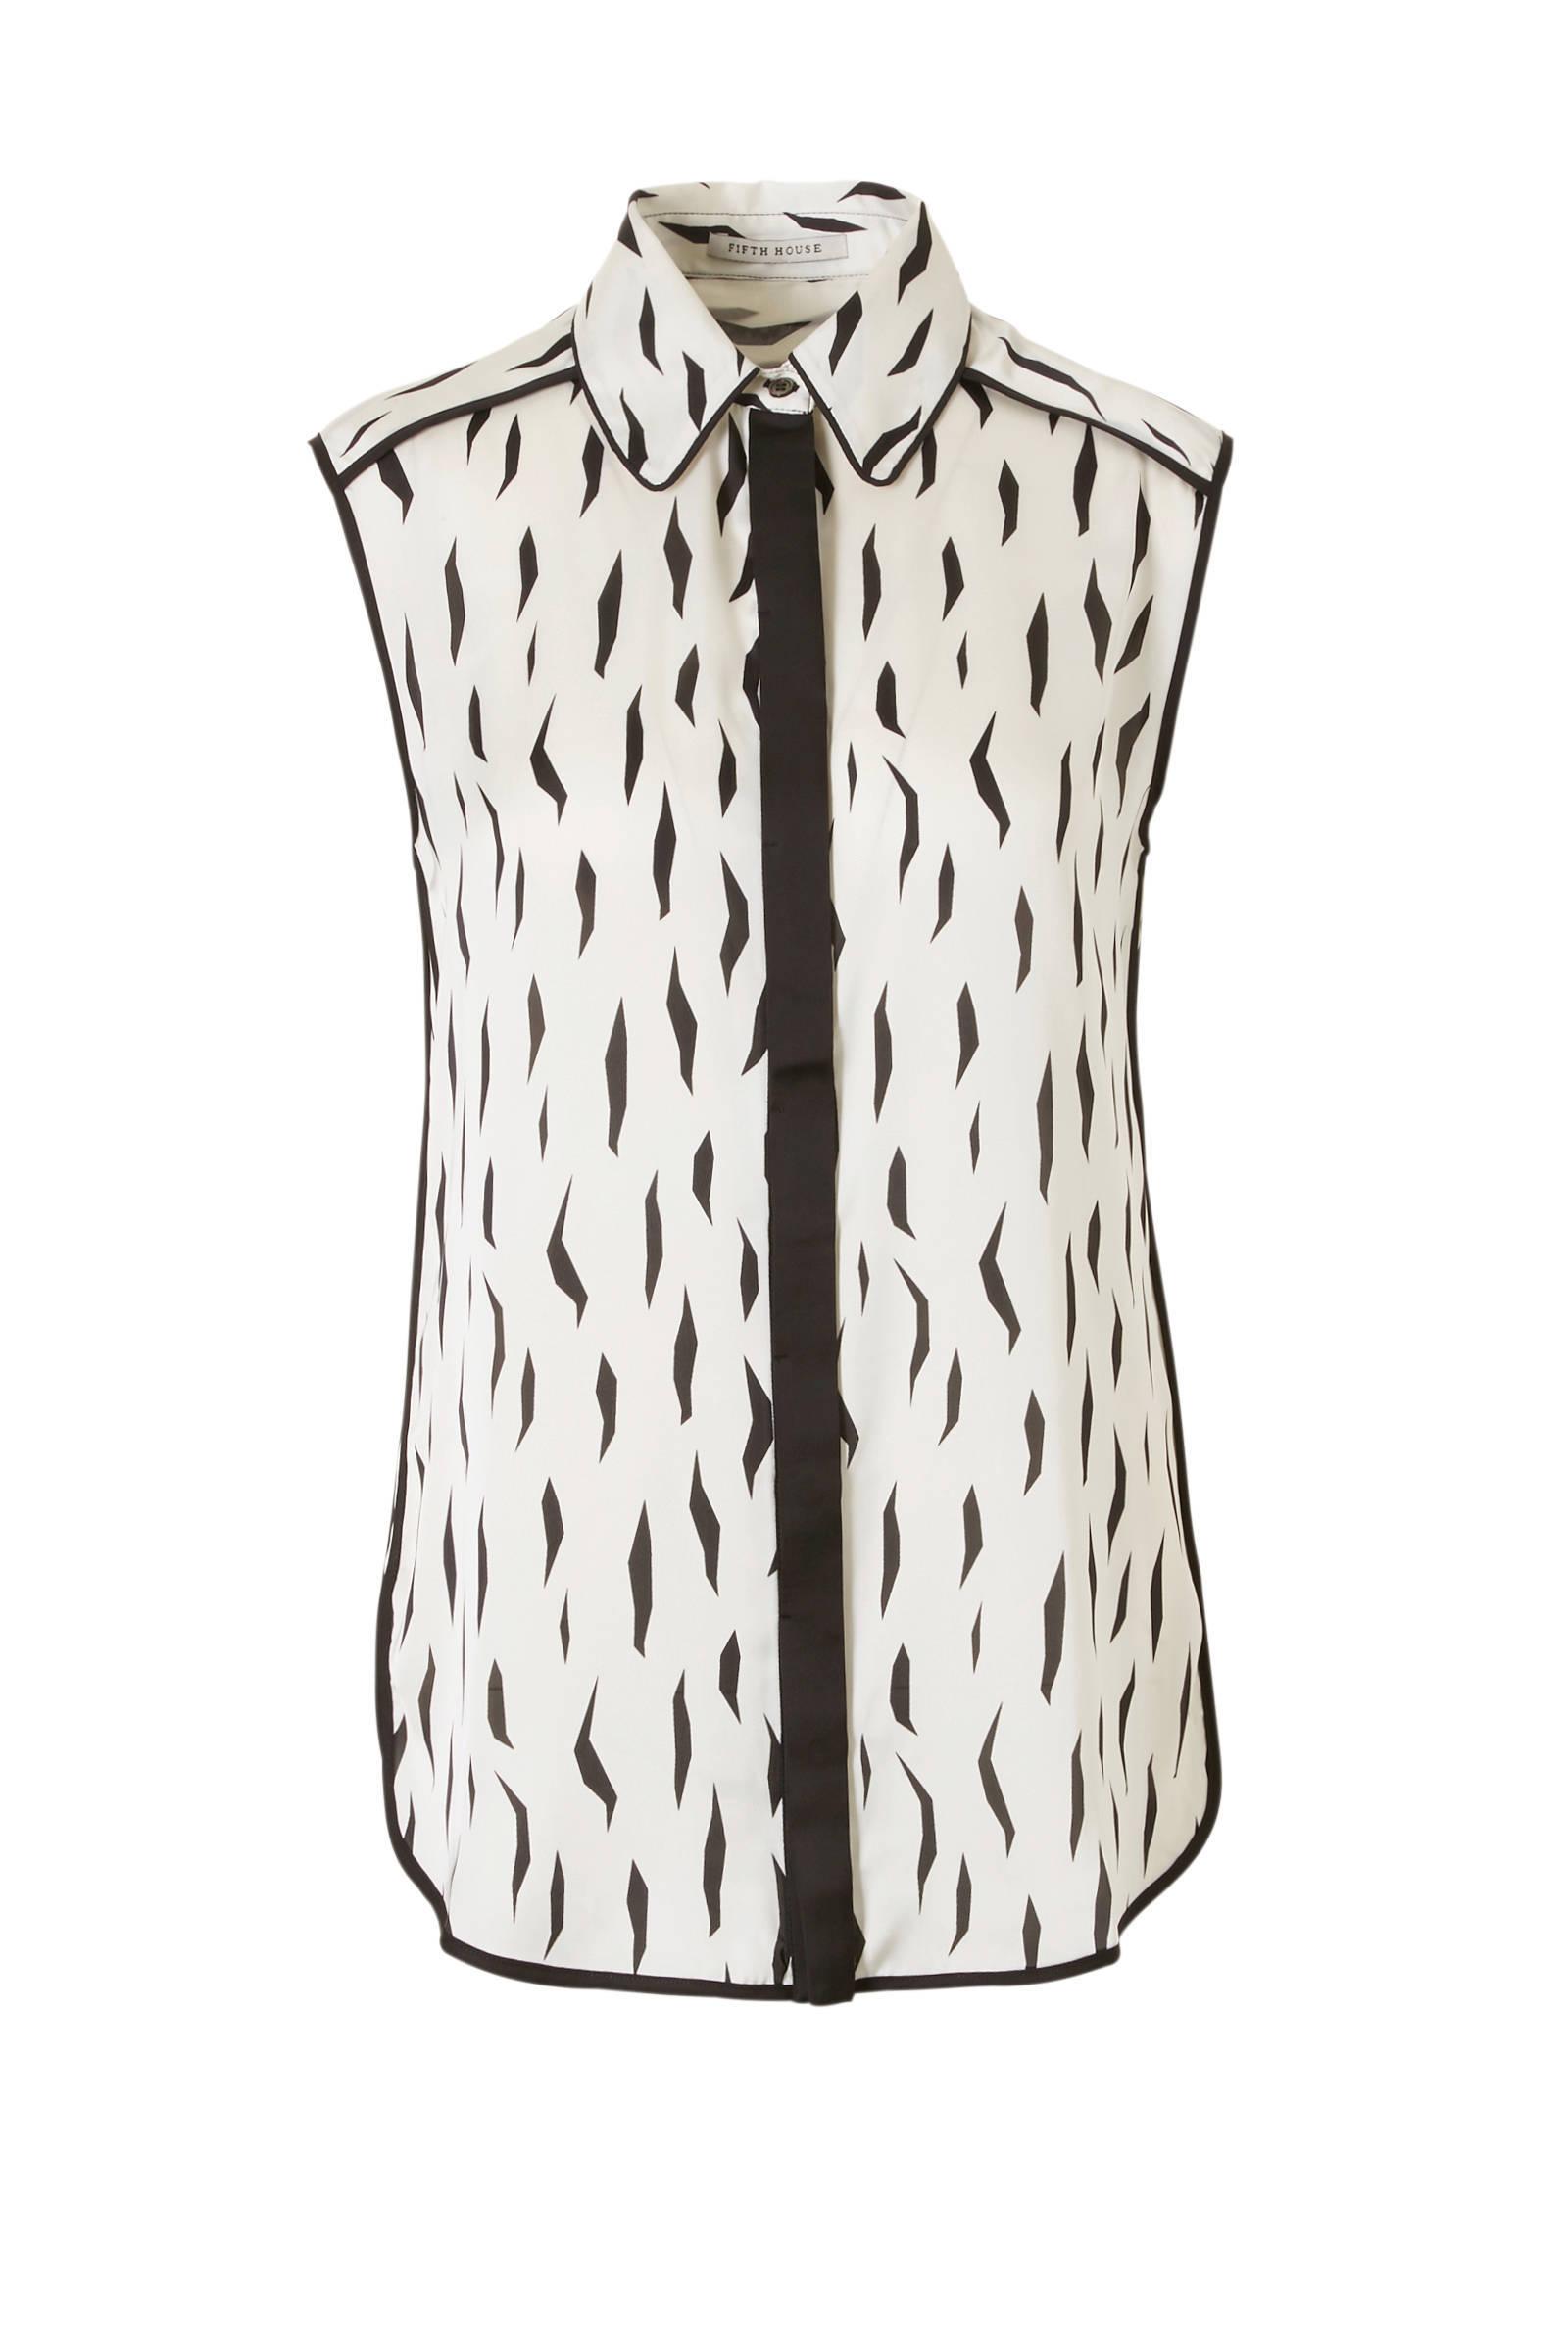 9a622561bd87d6 Gratis vanaf 20 tunieken wehkamp Dames bij blouses bezorging amp  q0xn7Xw